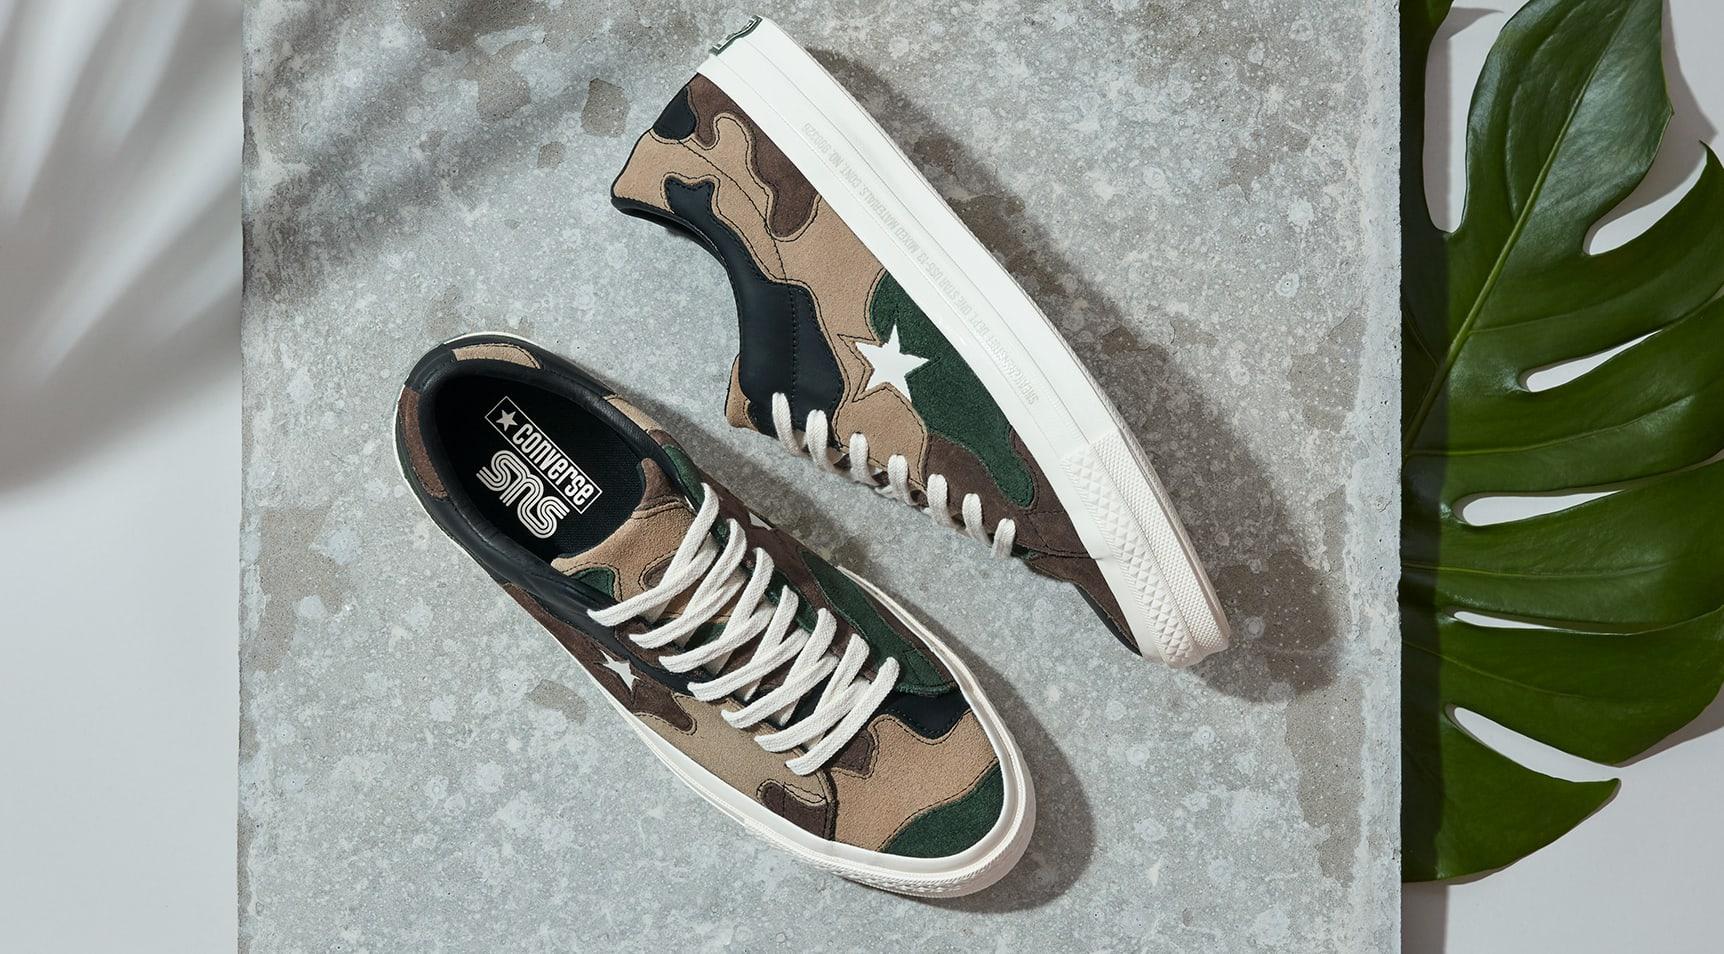 Sneakersnstuff x Converse One Star 'Canteen' (Top)